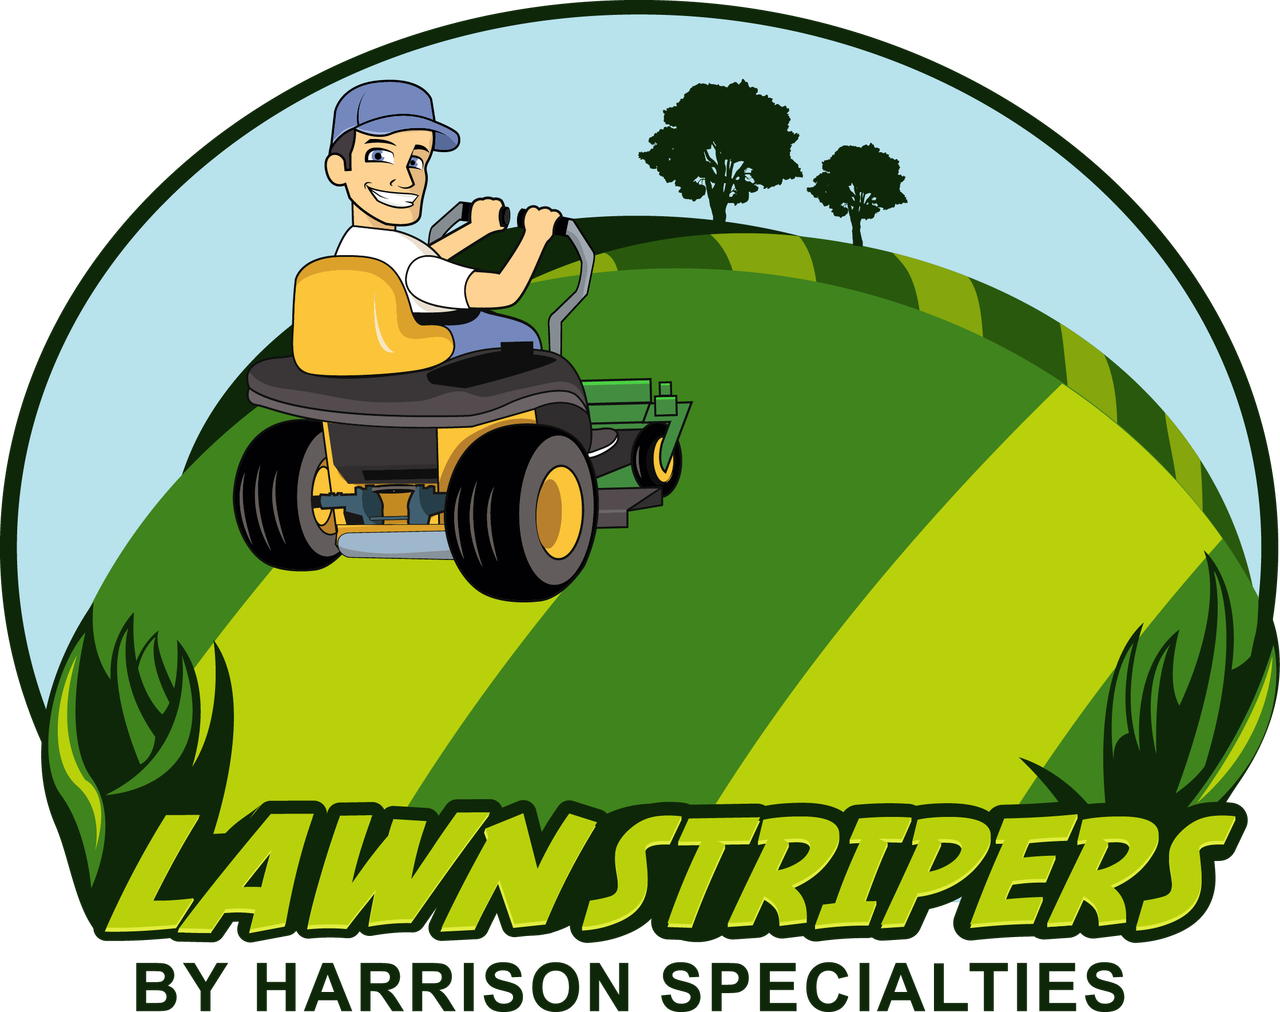 Toro Lawn Striper System Toro Zero Turn Lawn Mower